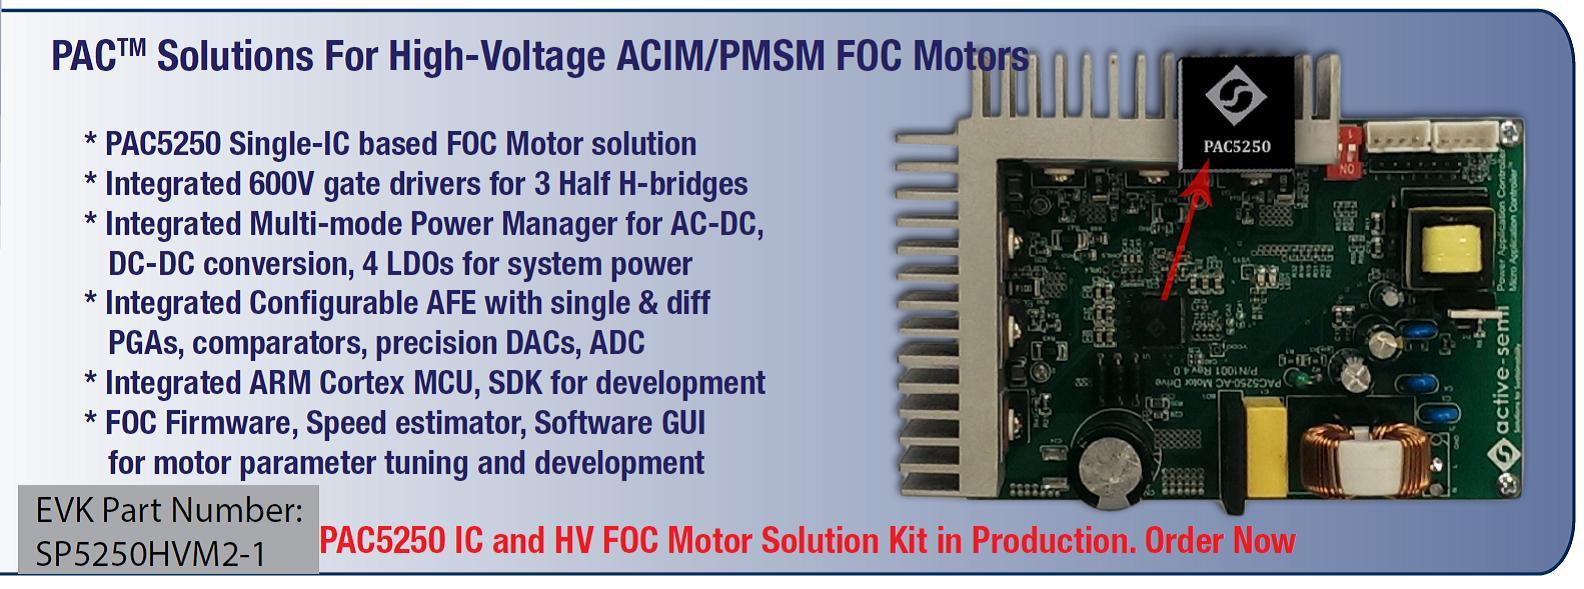 PAC Solutions for High-Voltage ACIM PMSM FOC Motors